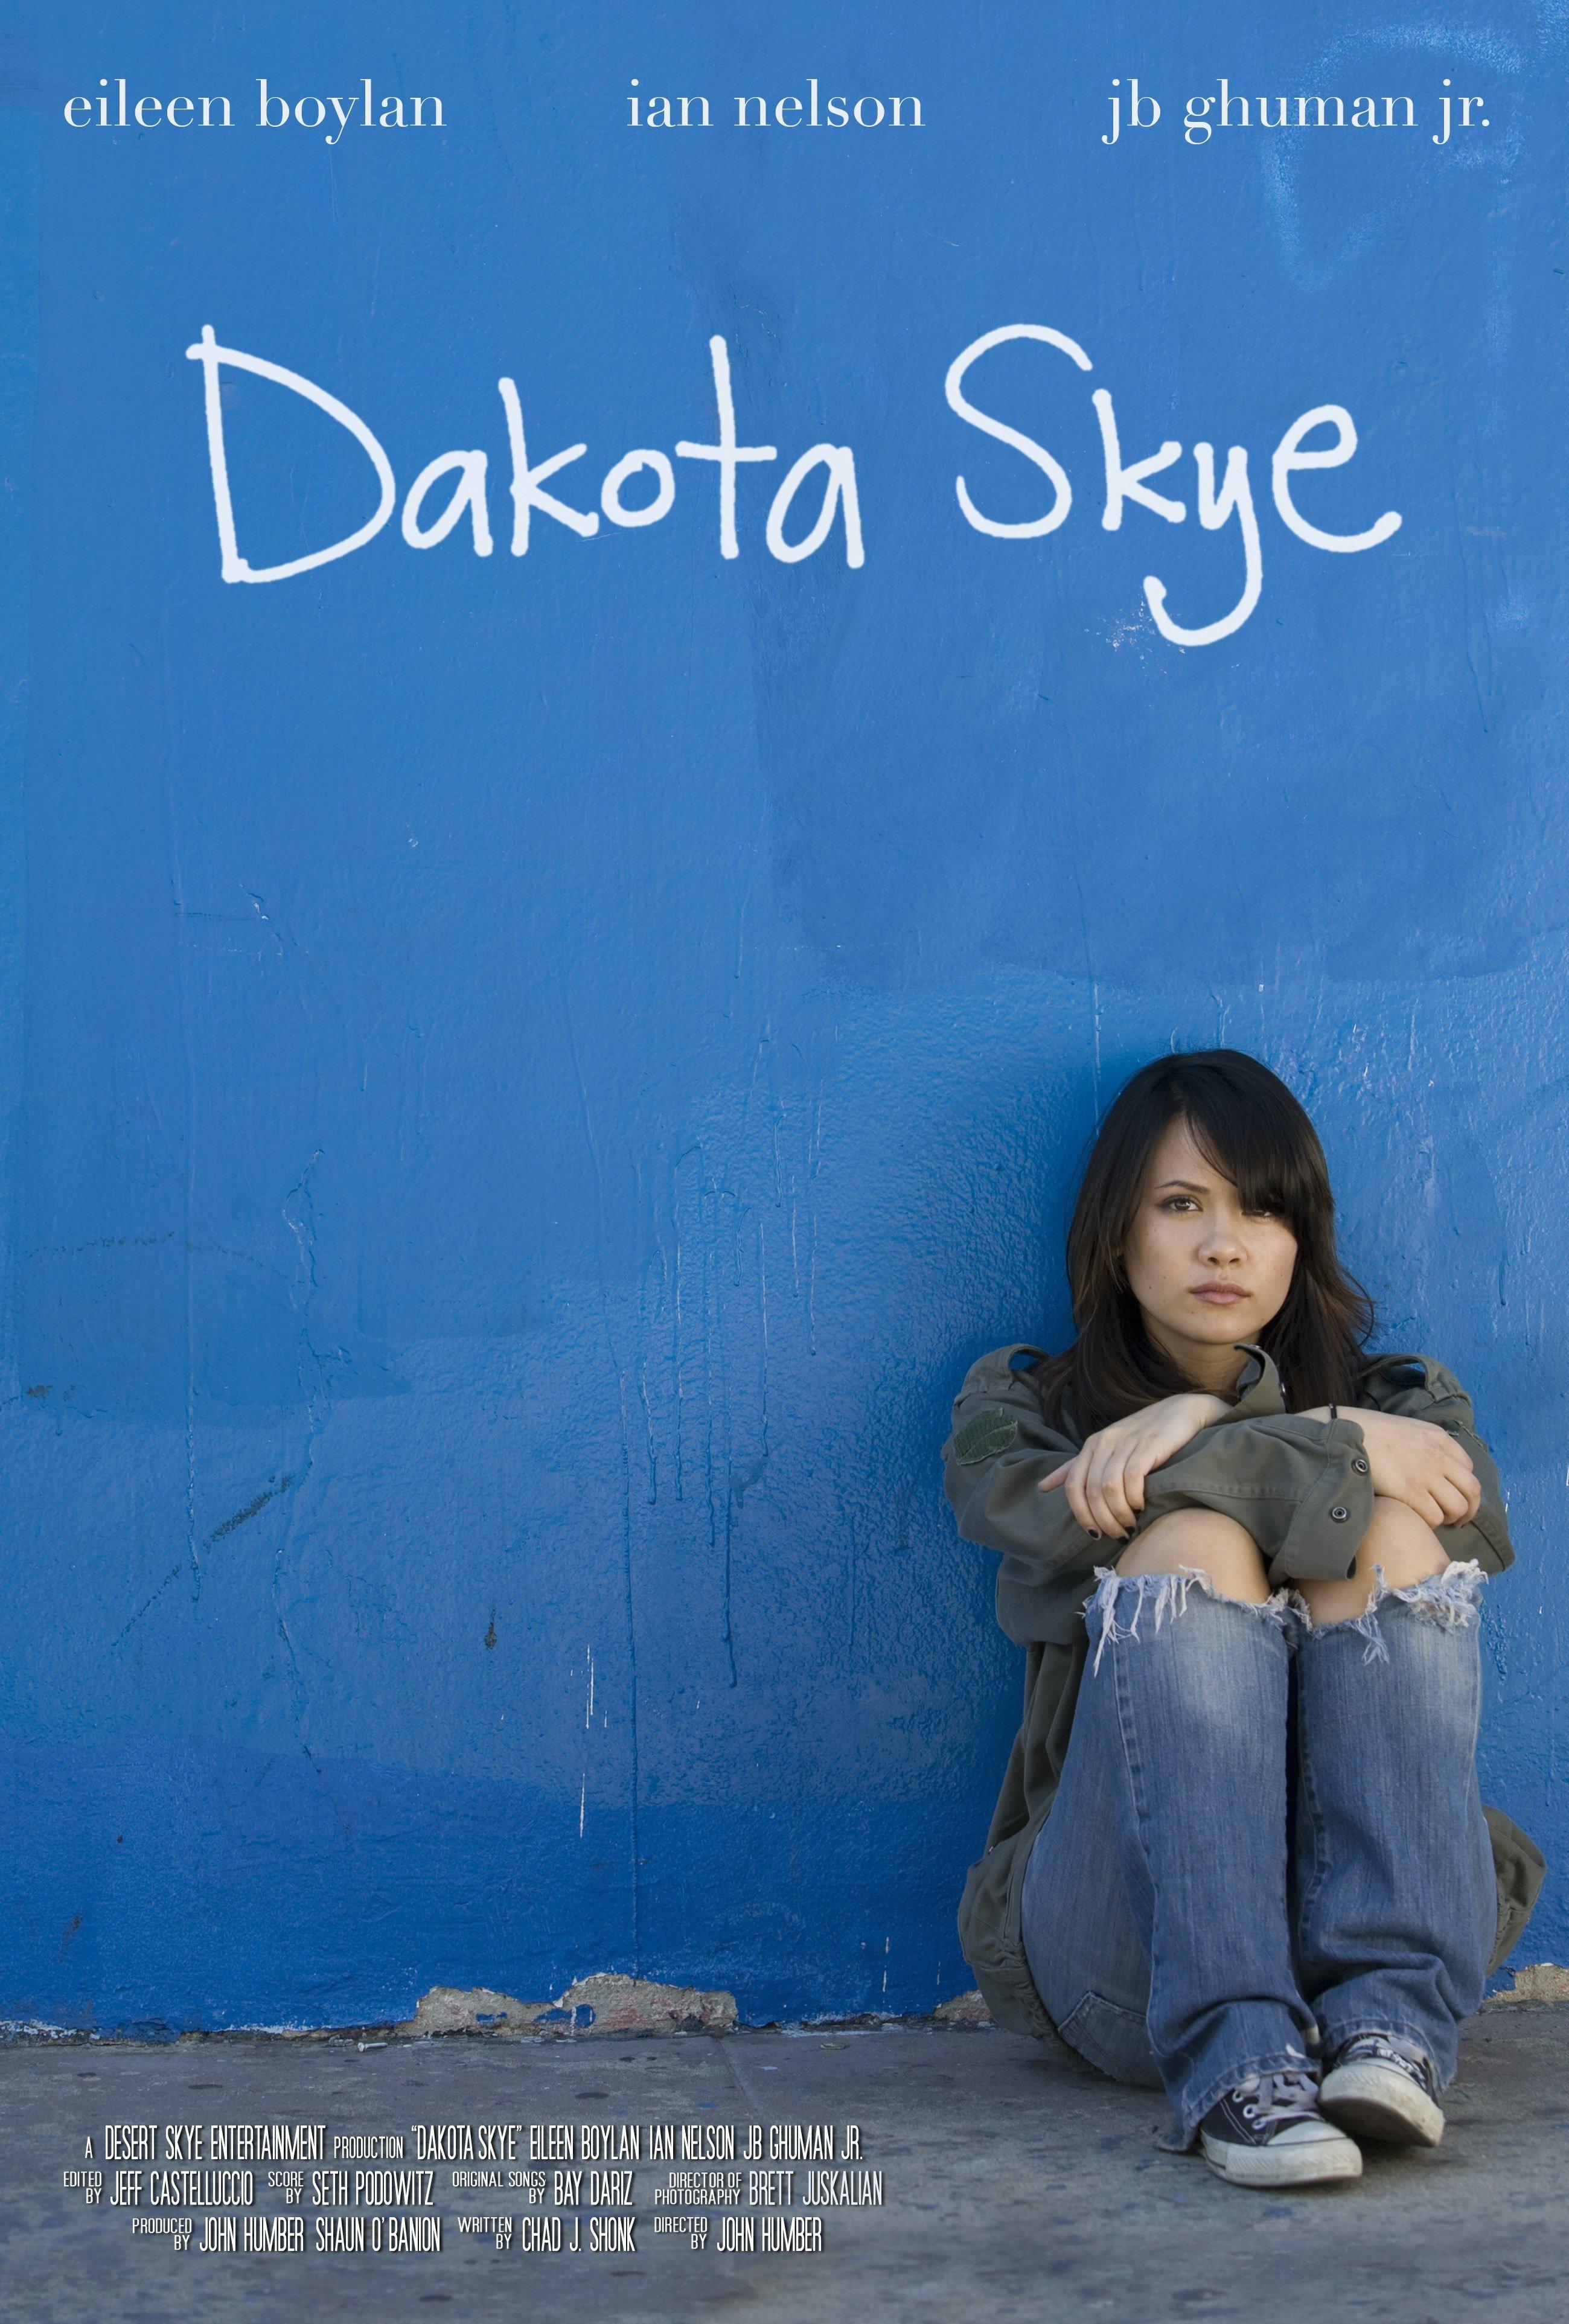 Dakota skye (2008) full movie